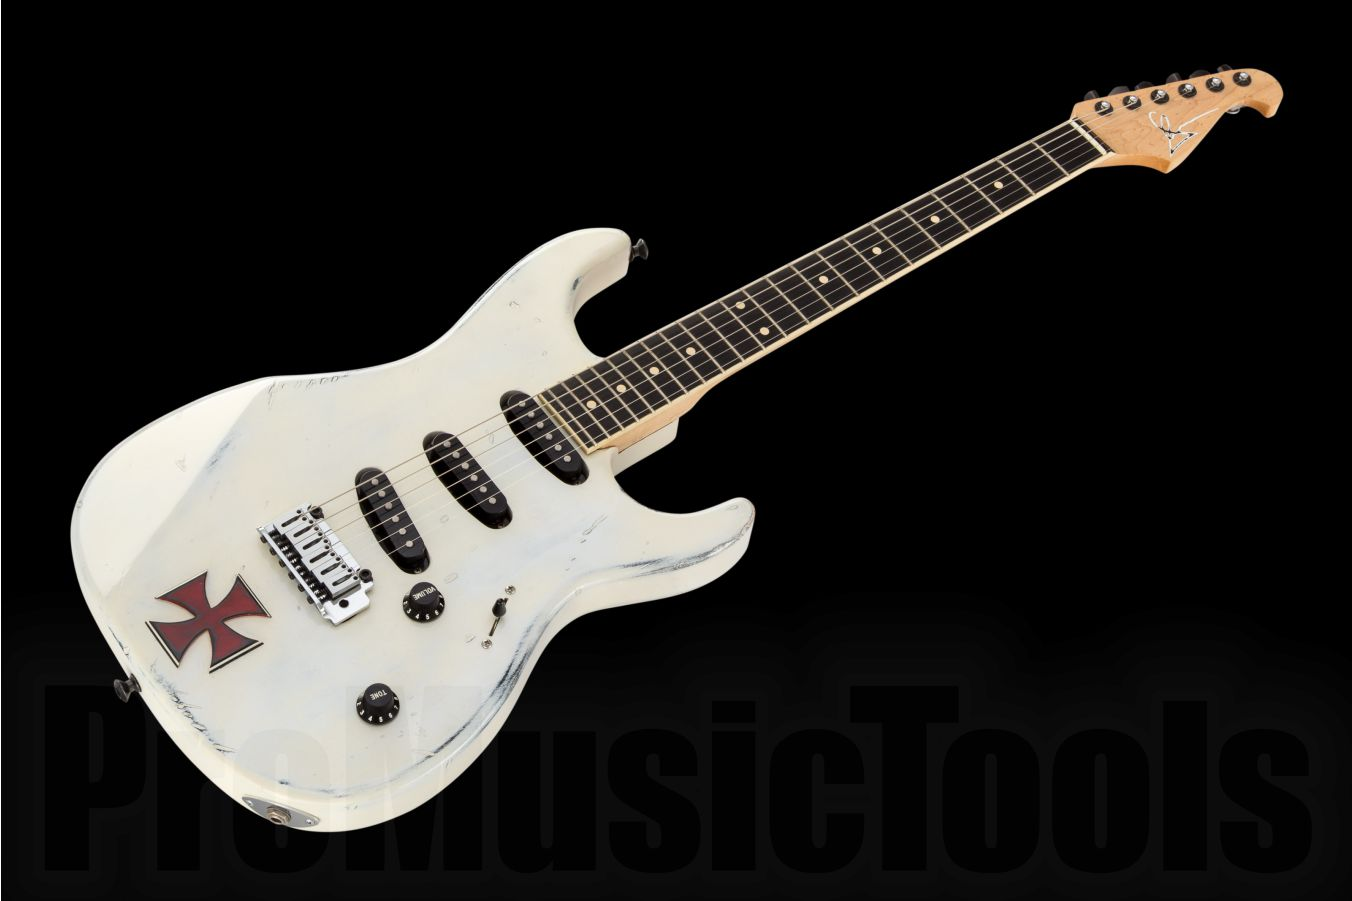 Gary Kramer USA Custom Shop Strat - Distressed White